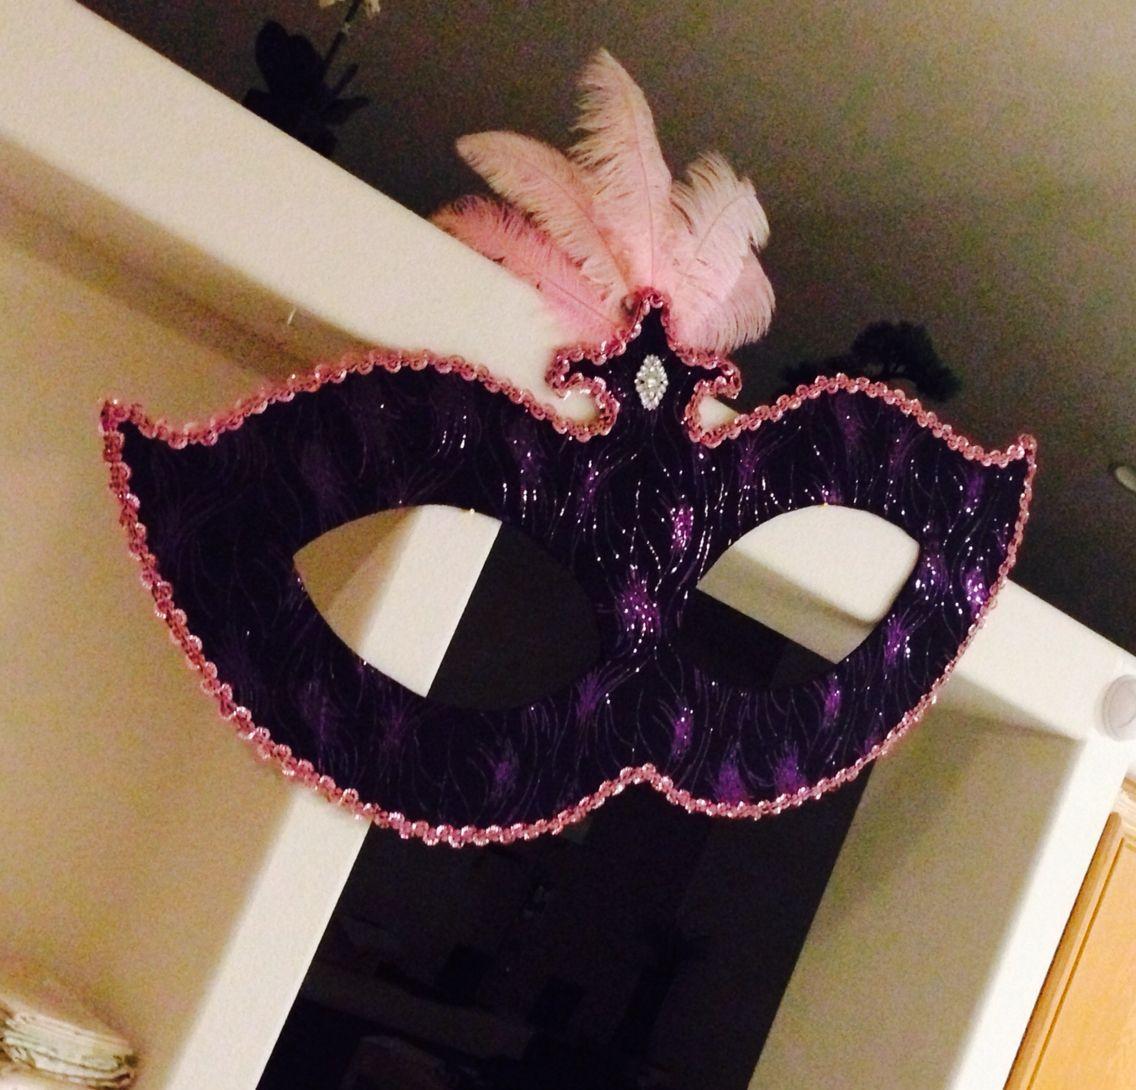 Masquerade Masks Decorations Ideas: Hanging Decorations. Made Using